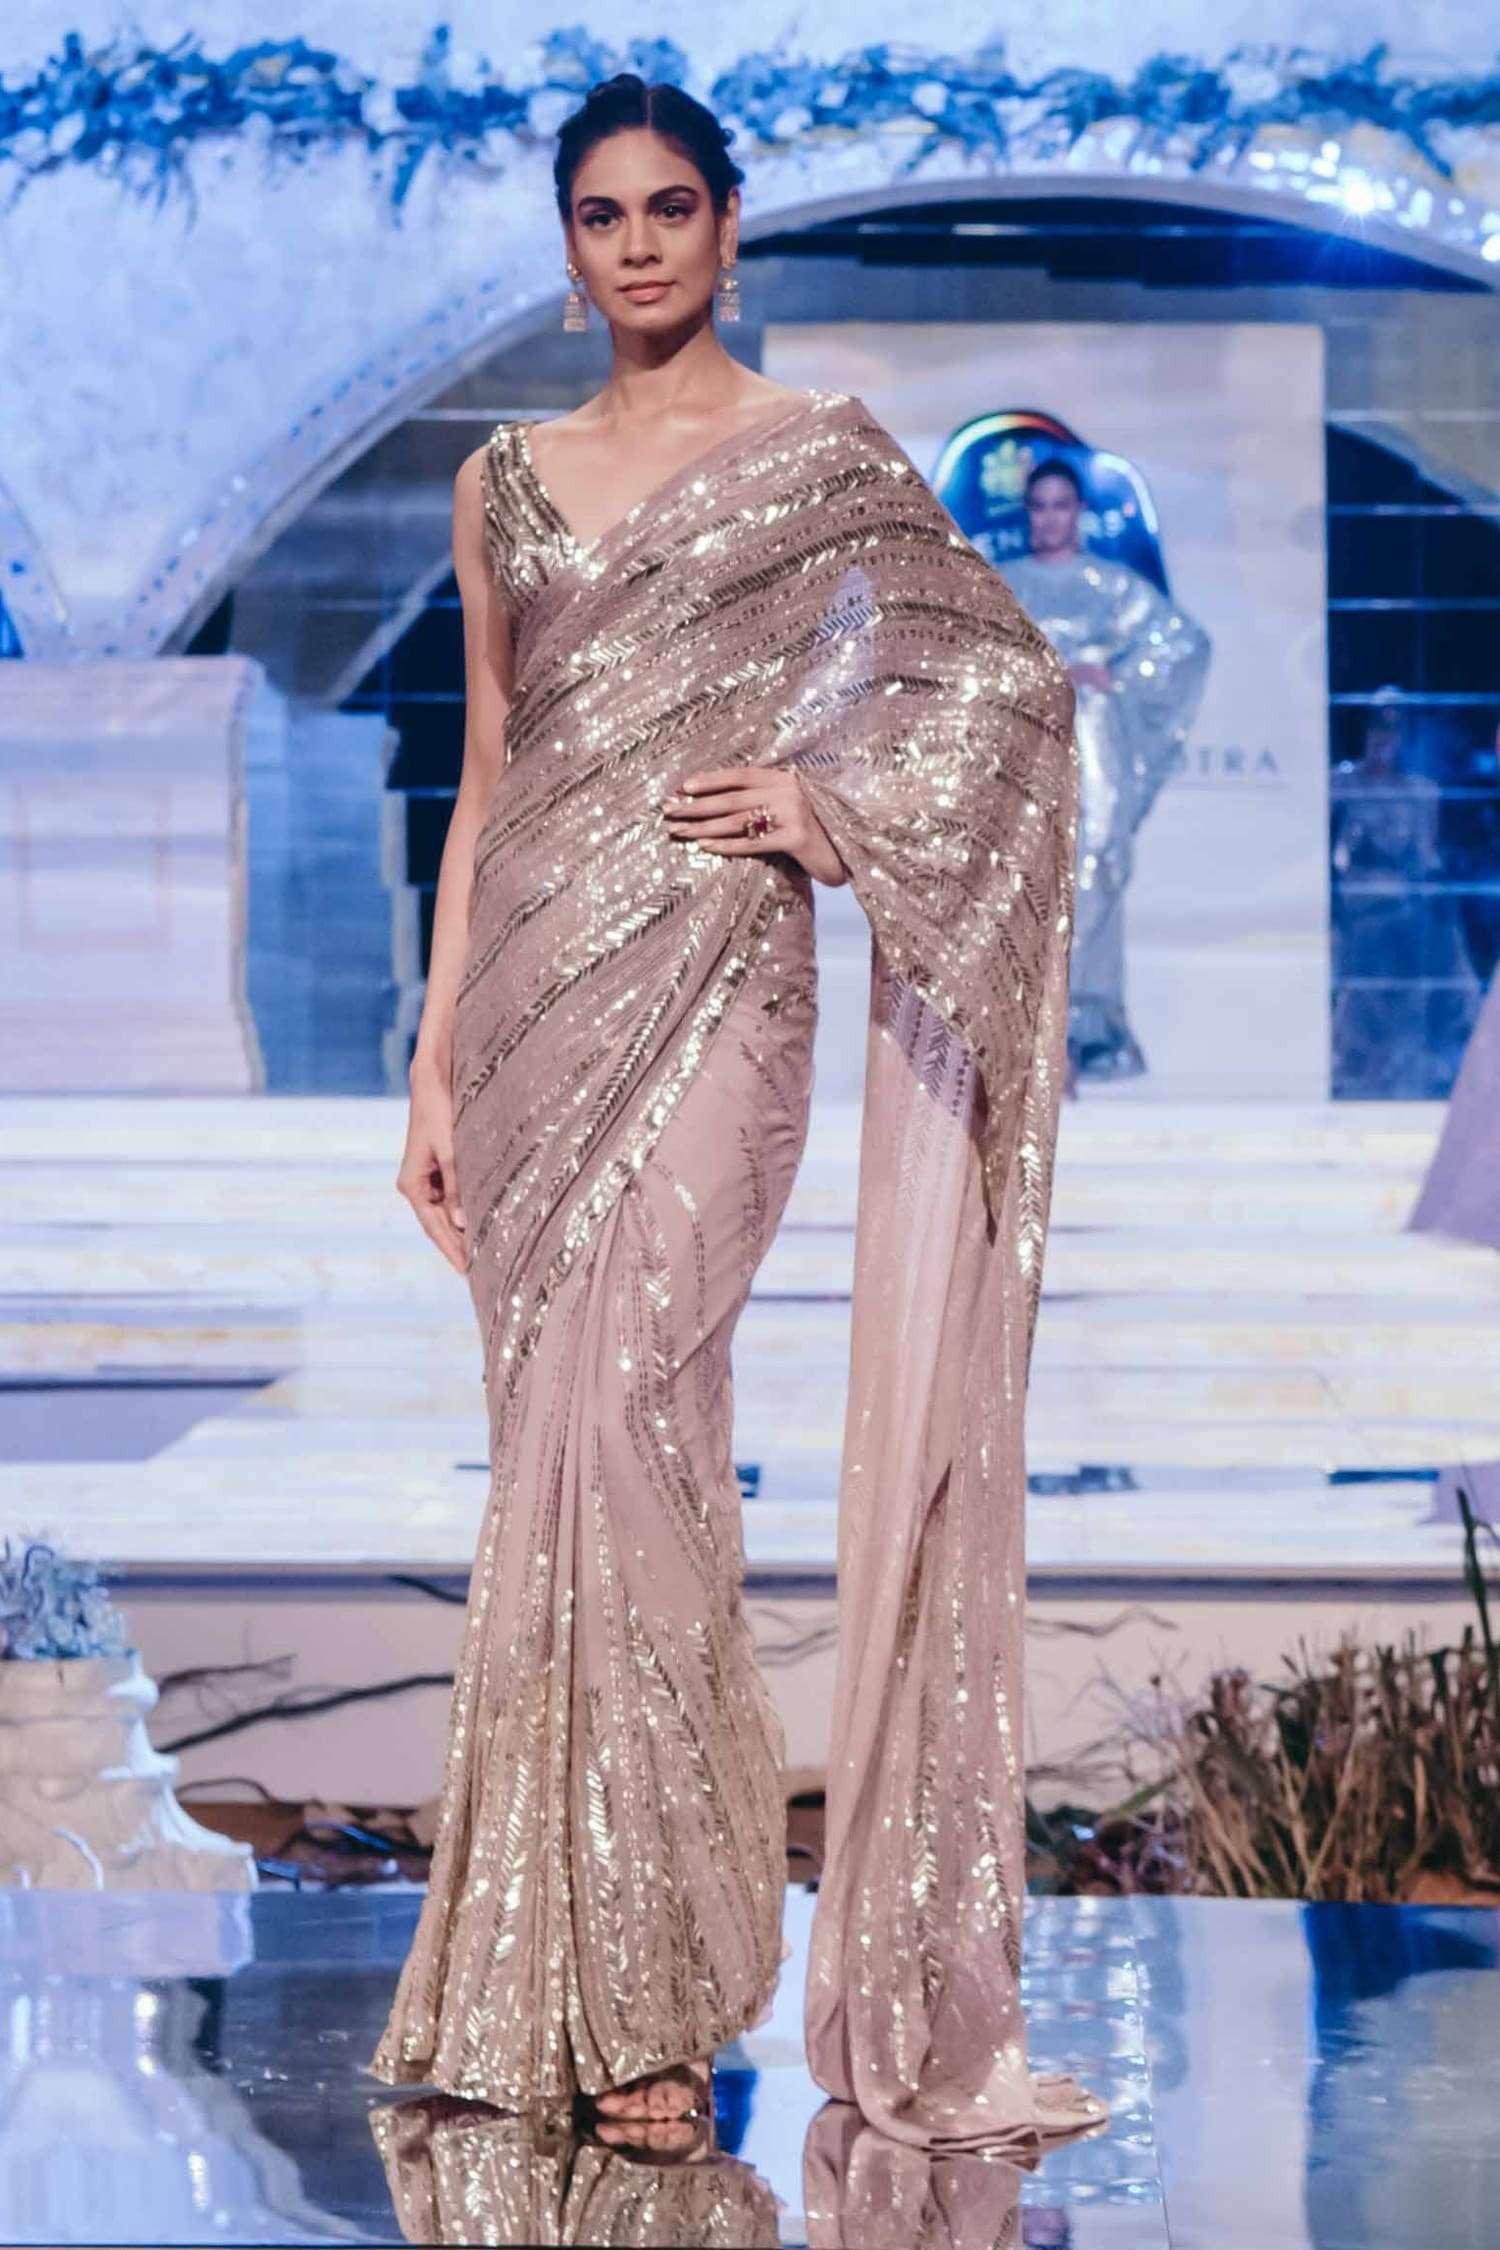 Sequined Saree By Manish Malhotra